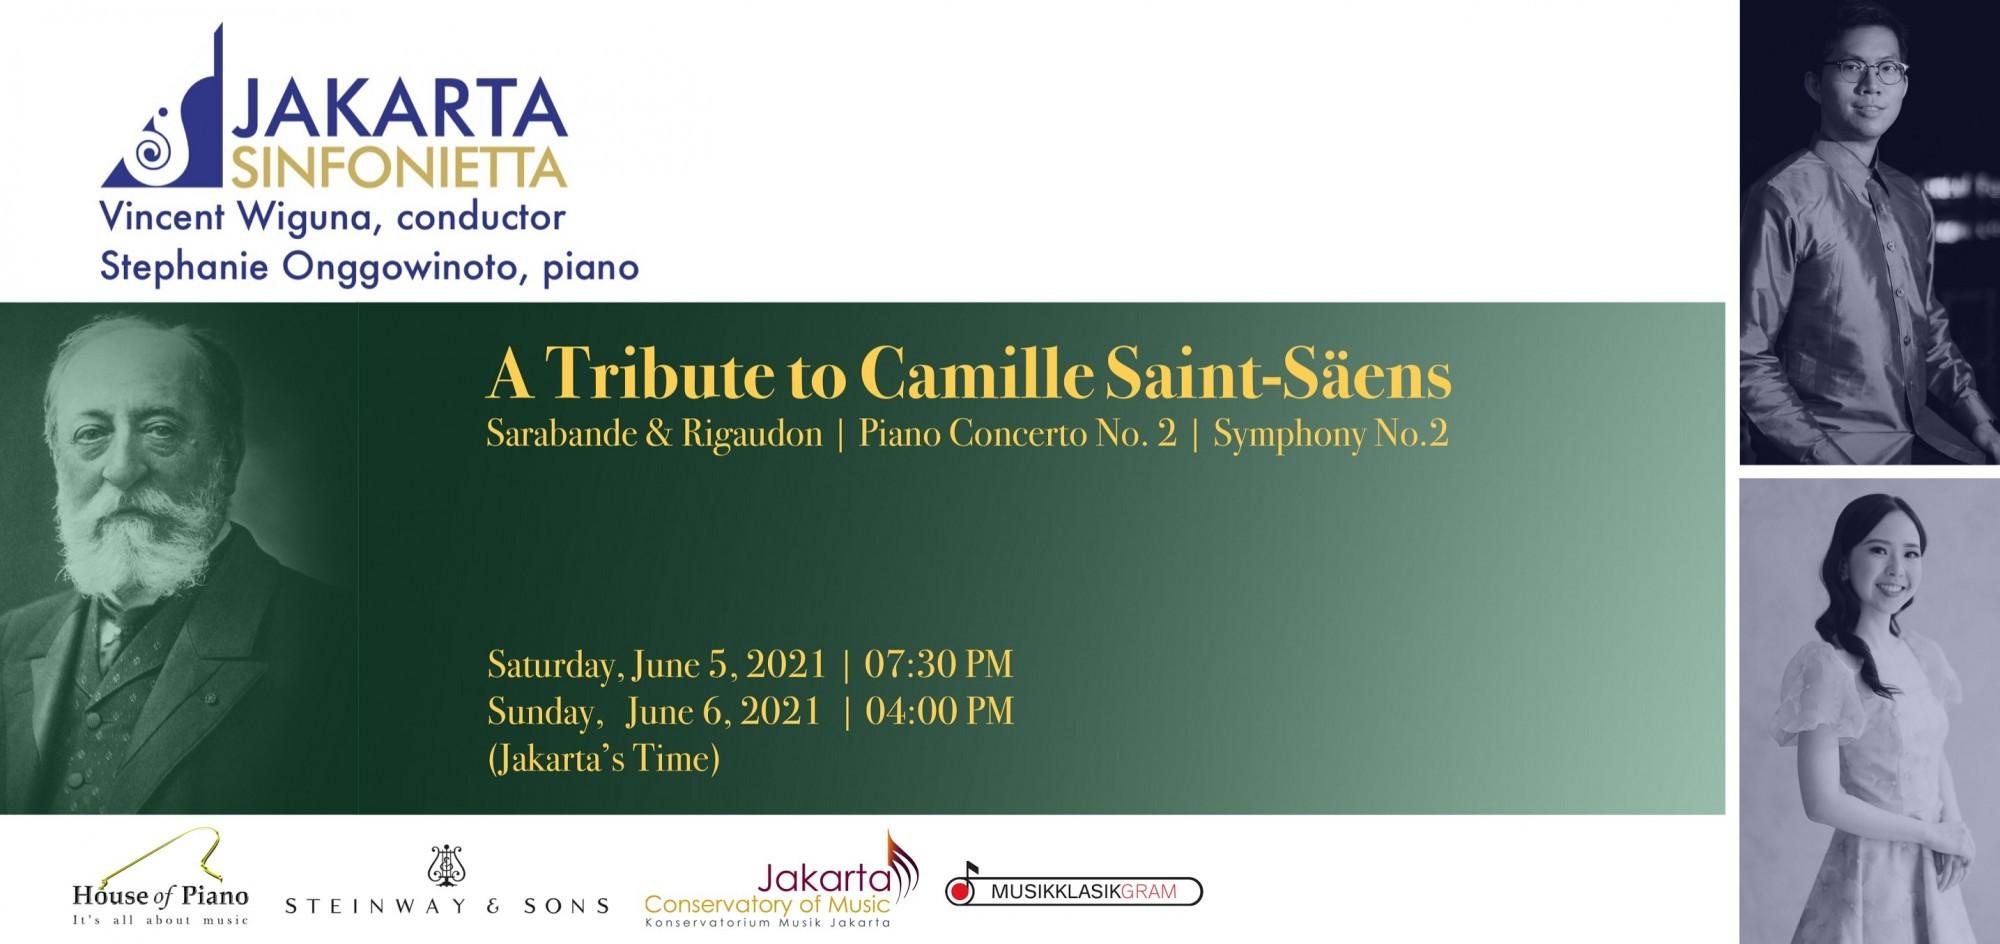 Jakarta Sinfonietta & Stephanie Onggowinoto: A Tribute to Camille Saint-Saëns (06/06/21)